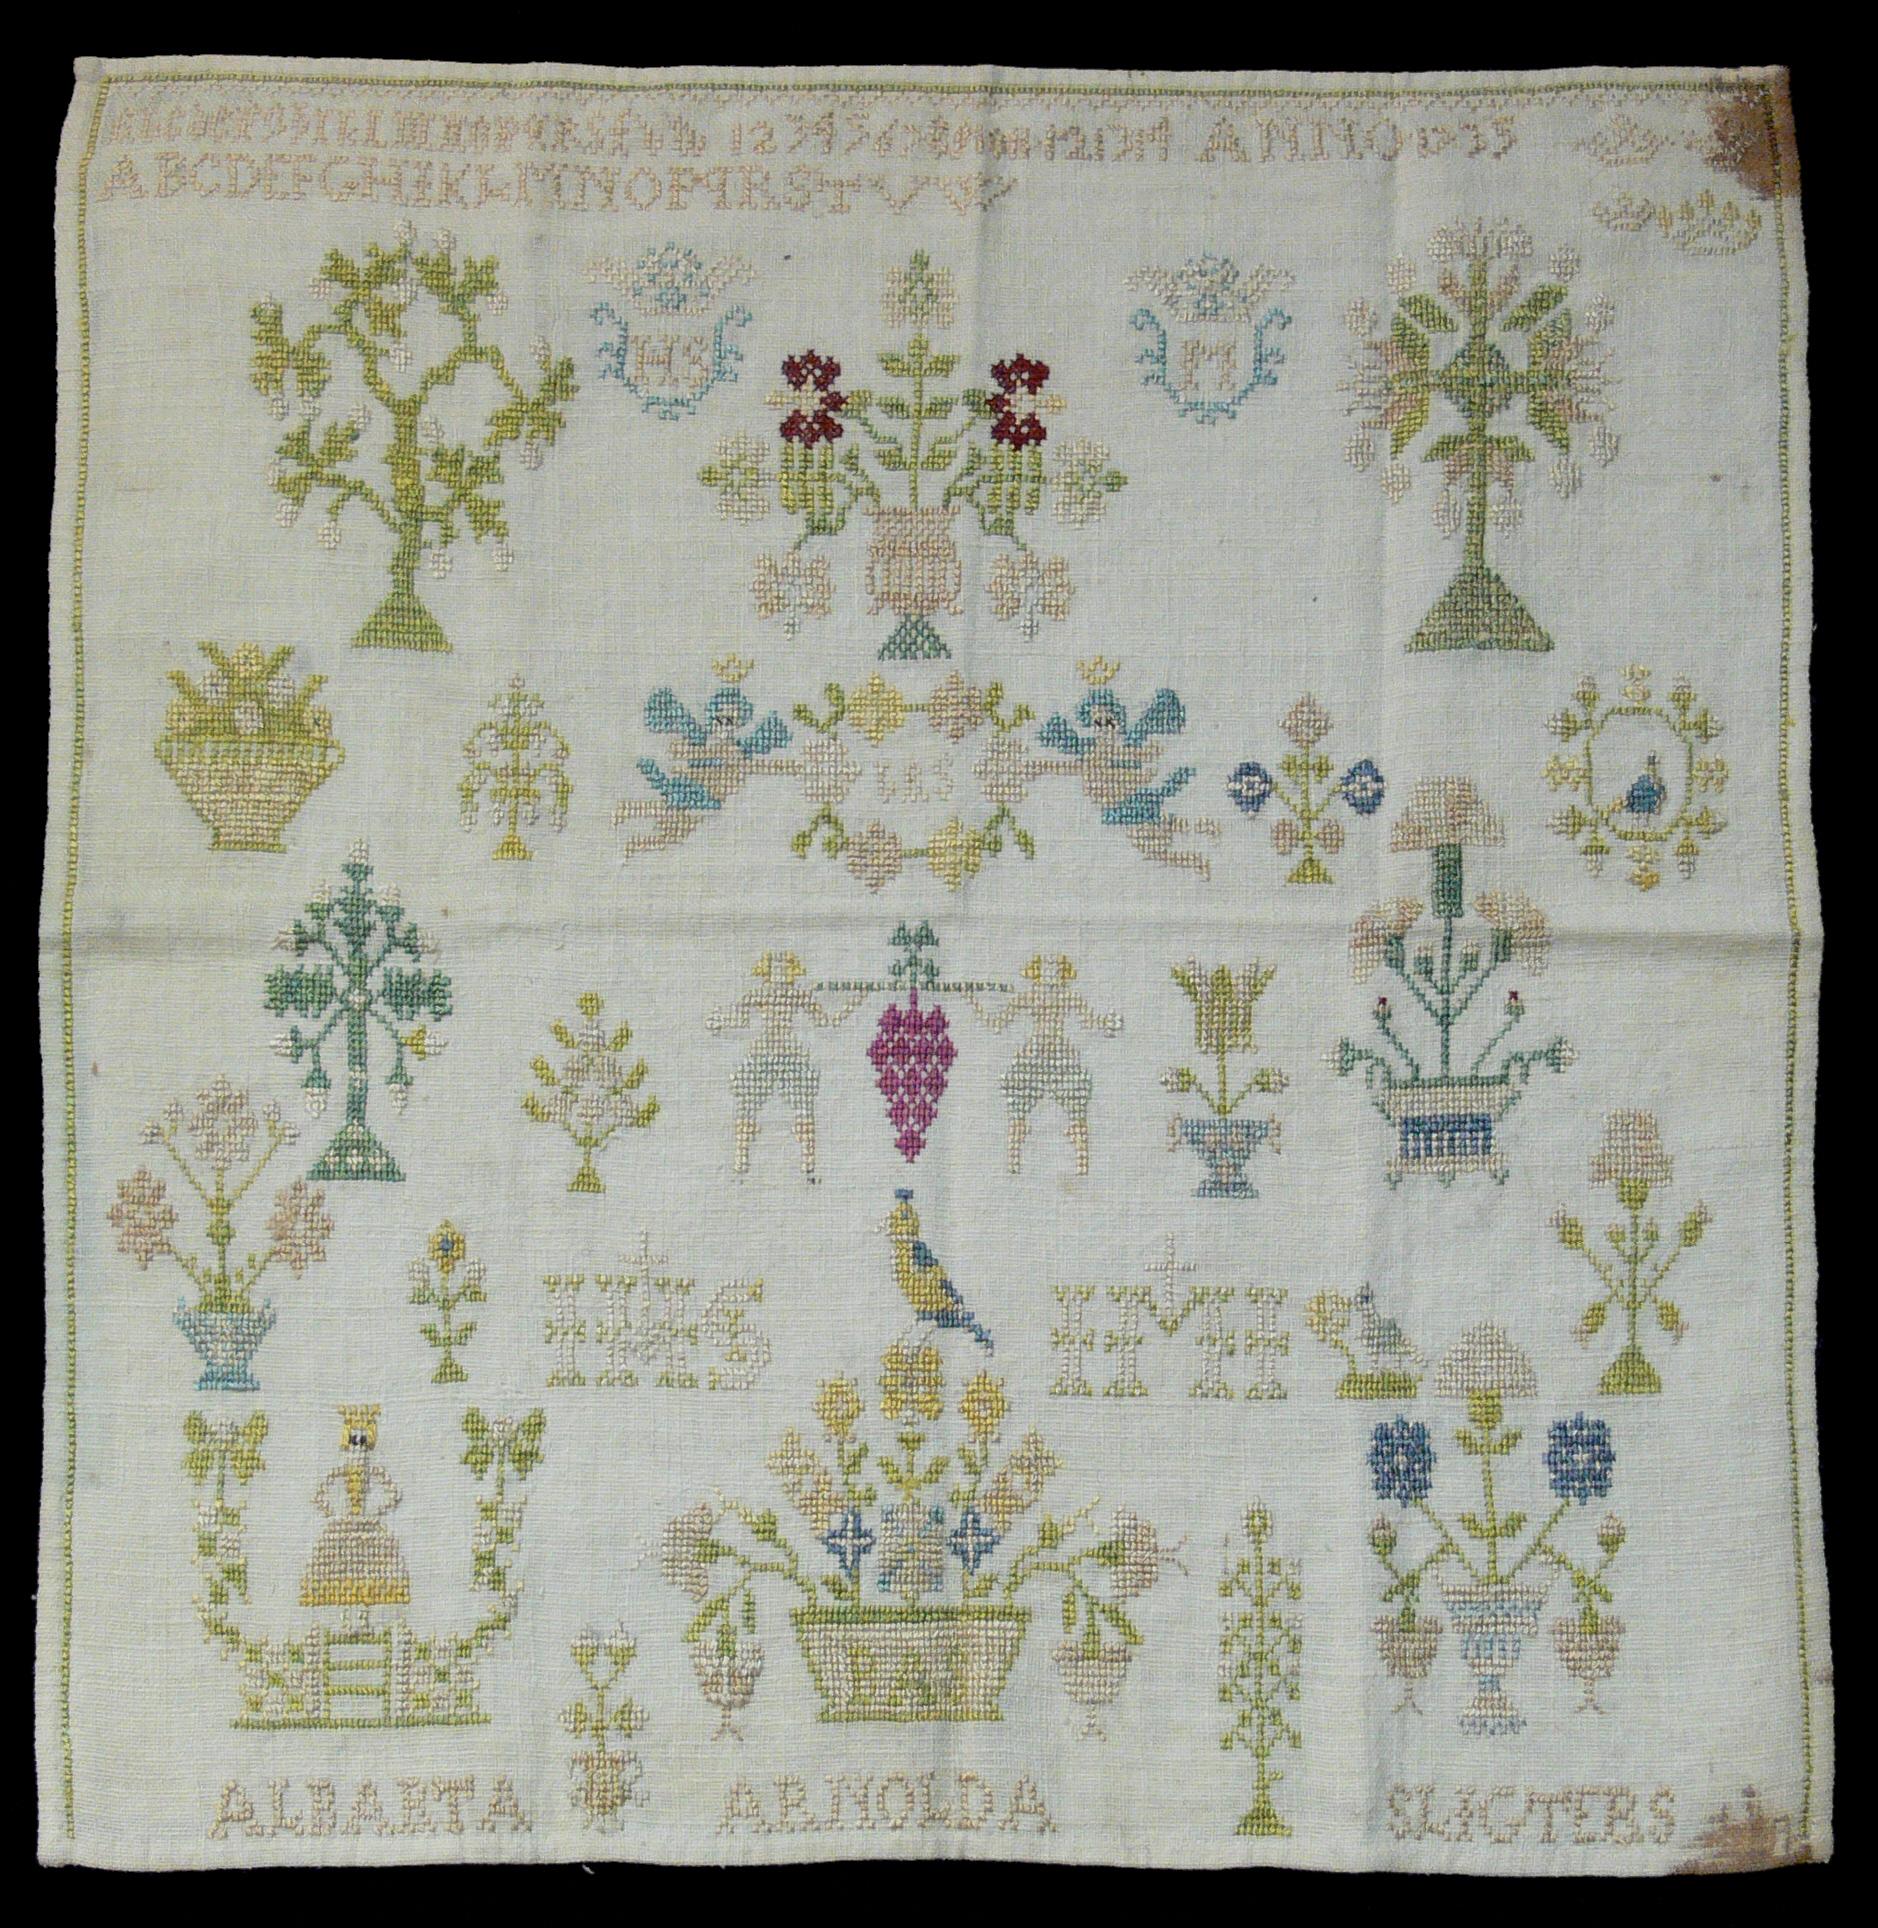 Paper Embroidery Cards Free Patterns Cross Stitch Wikipedia